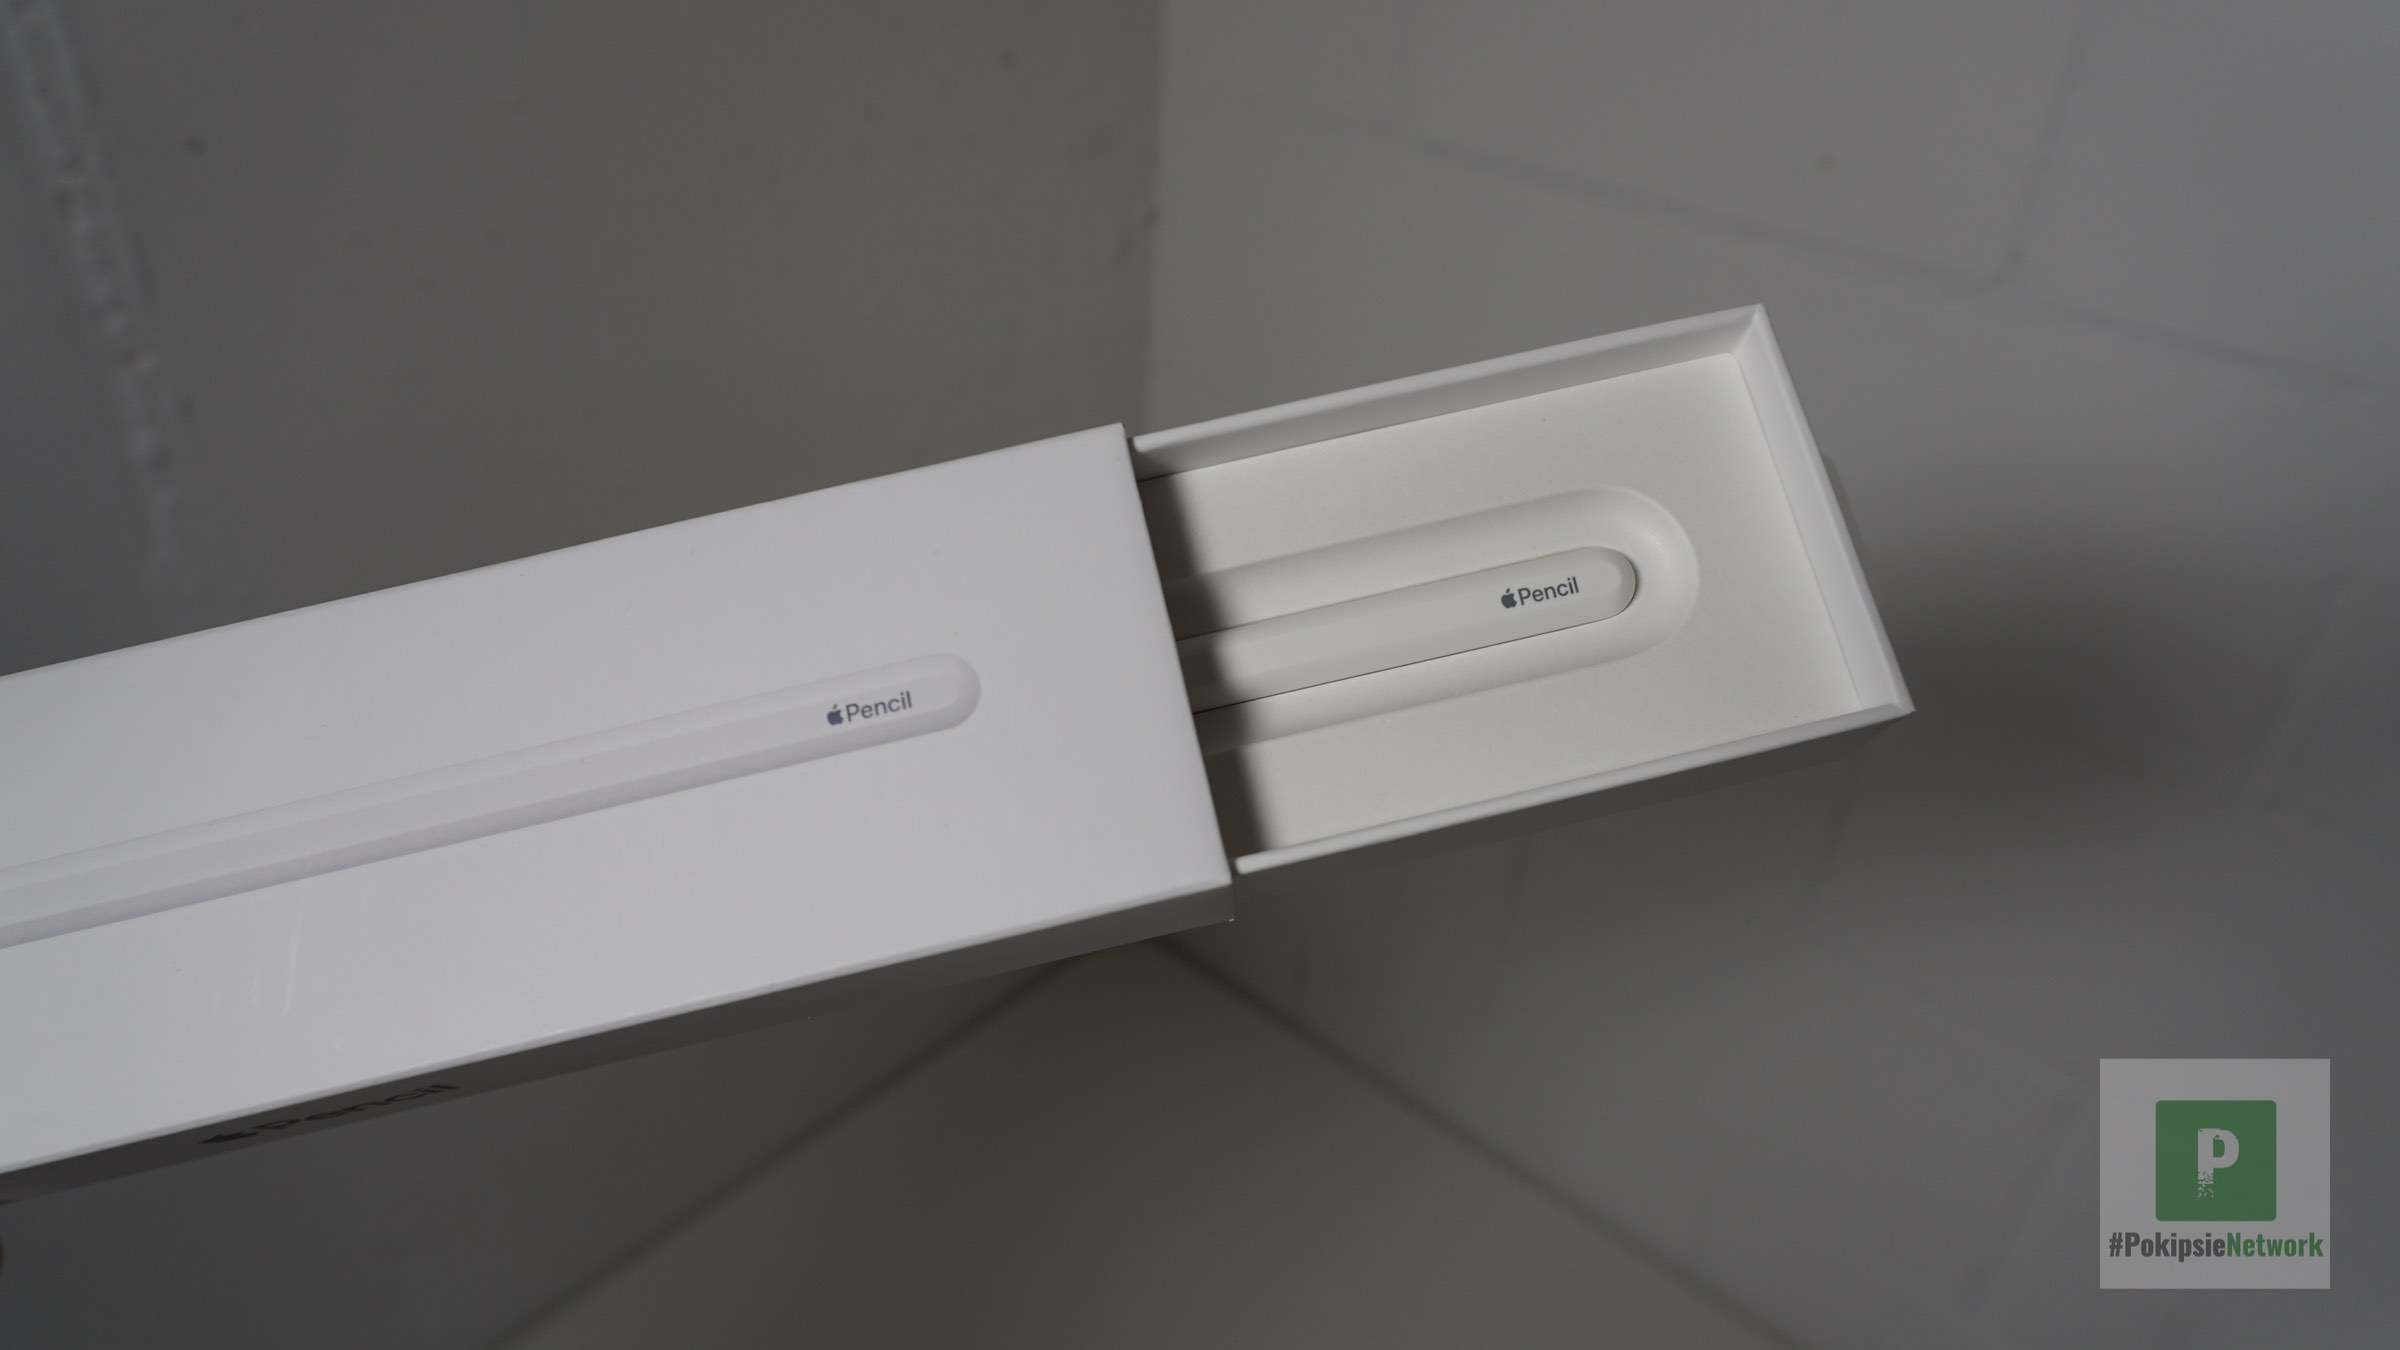 Der Pencil in der Original Verpackung